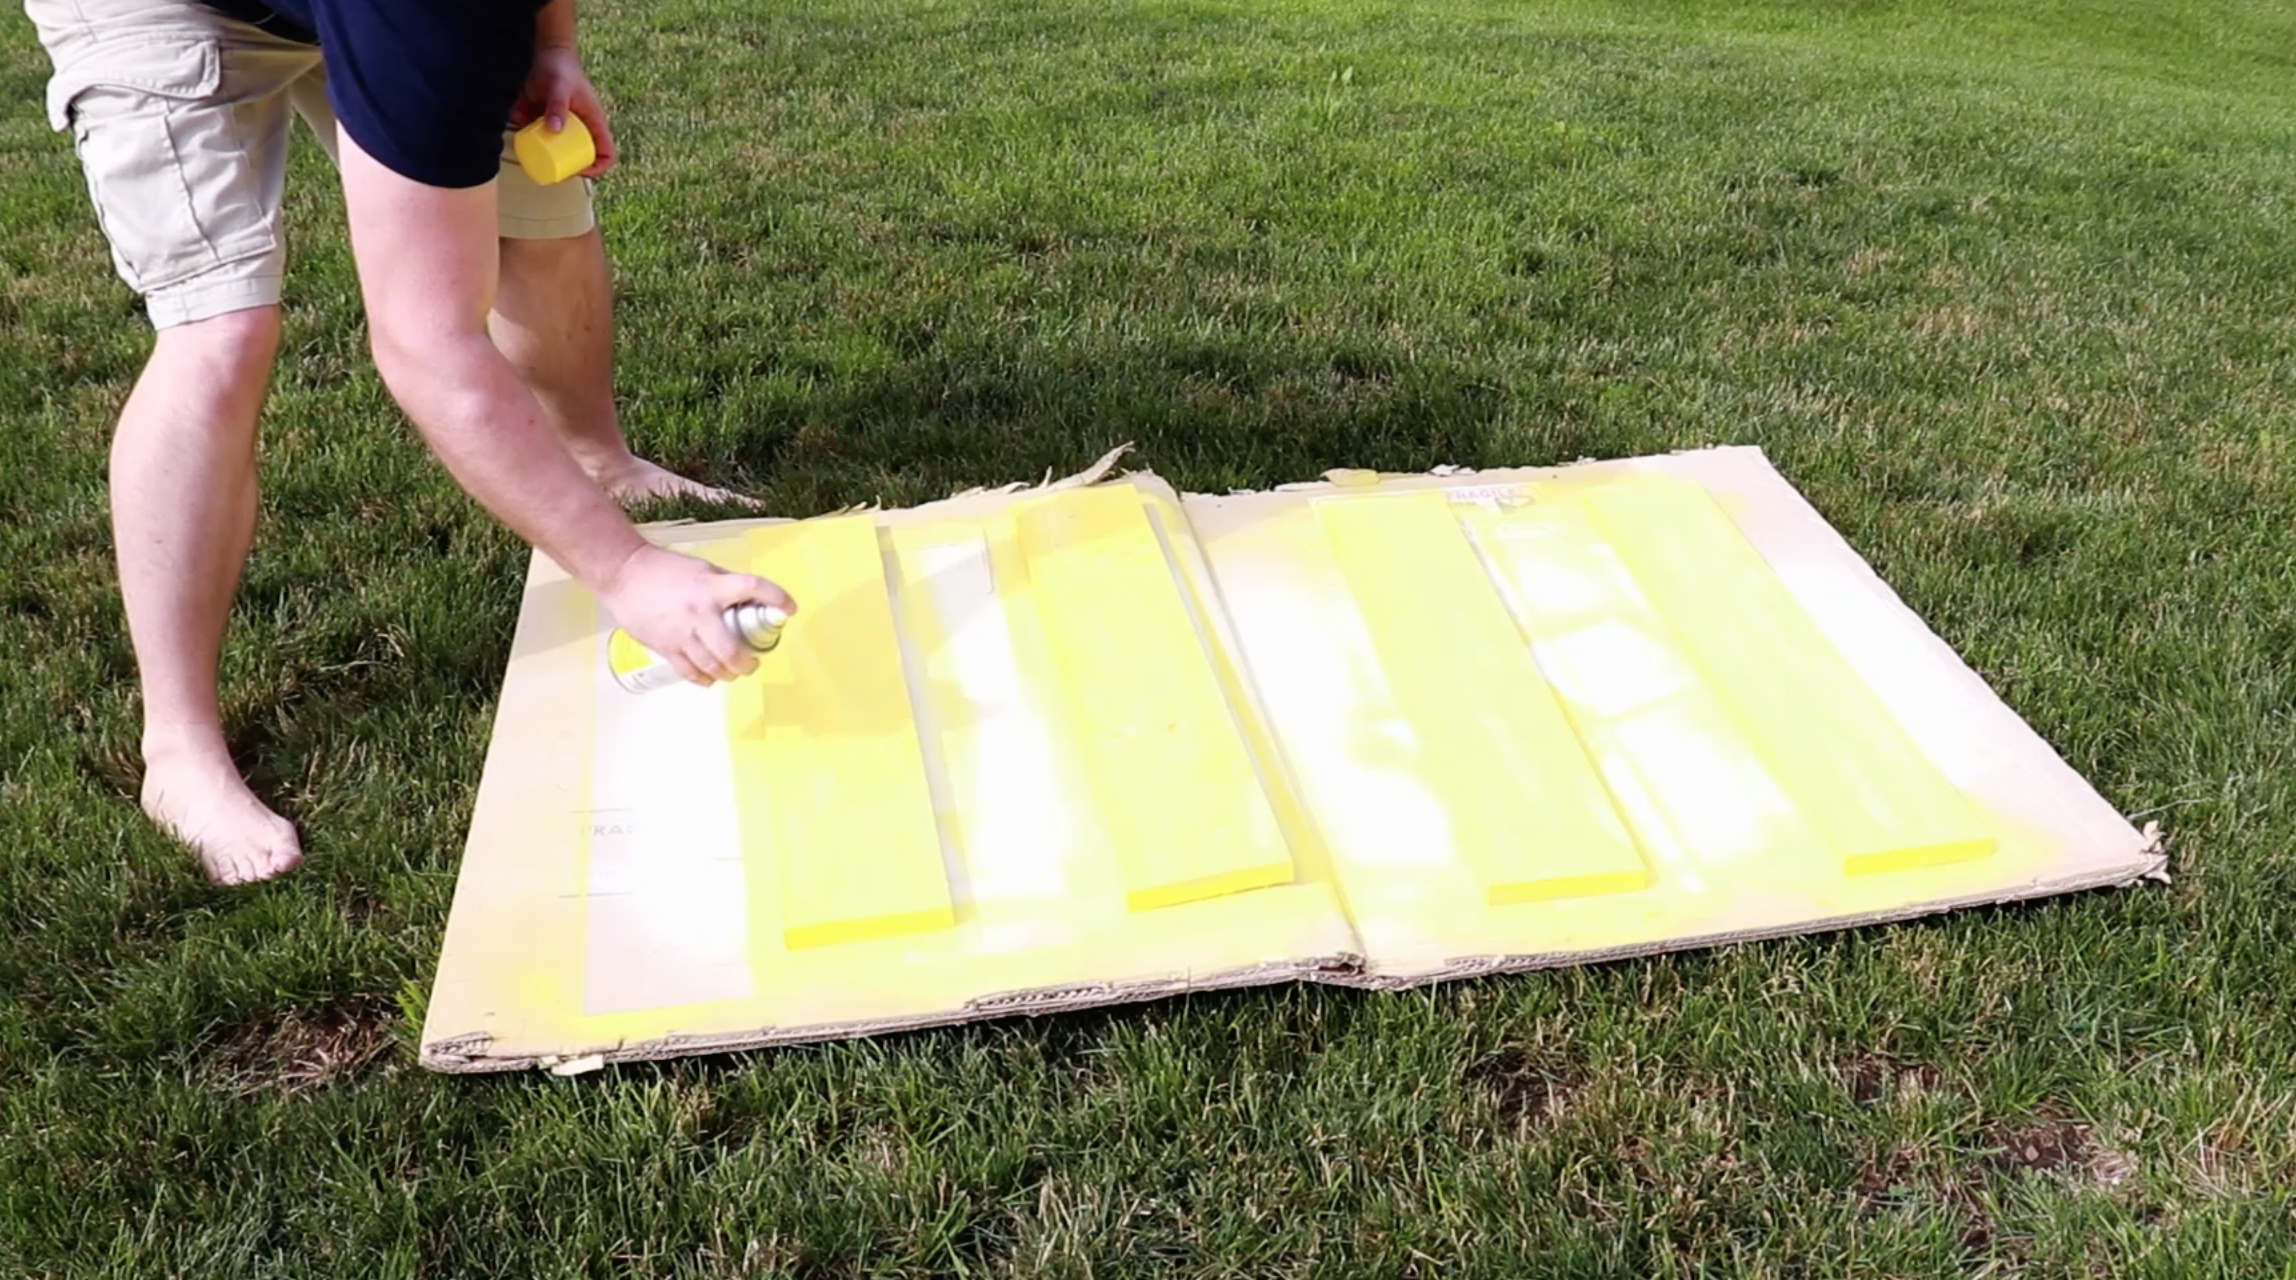 Spray painting the lemonade stand yellow